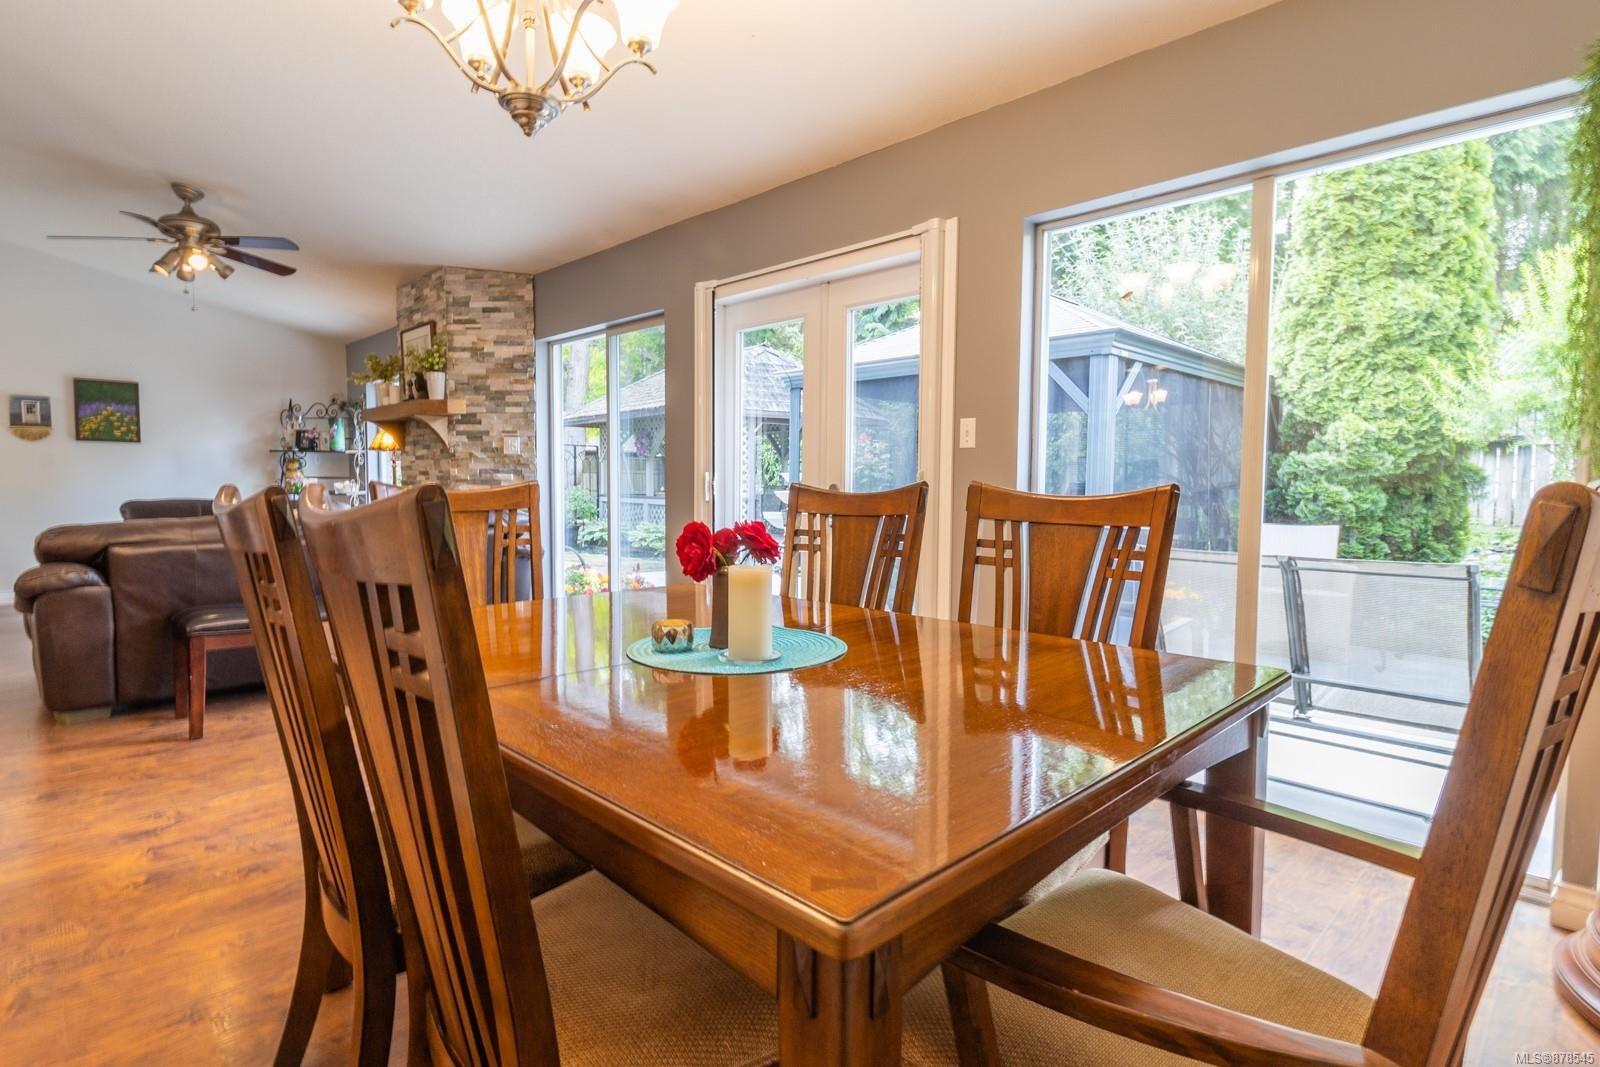 Photo 15: Photos: 1070 Symons Cres in : PQ Qualicum Beach House for sale (Parksville/Qualicum)  : MLS®# 878545